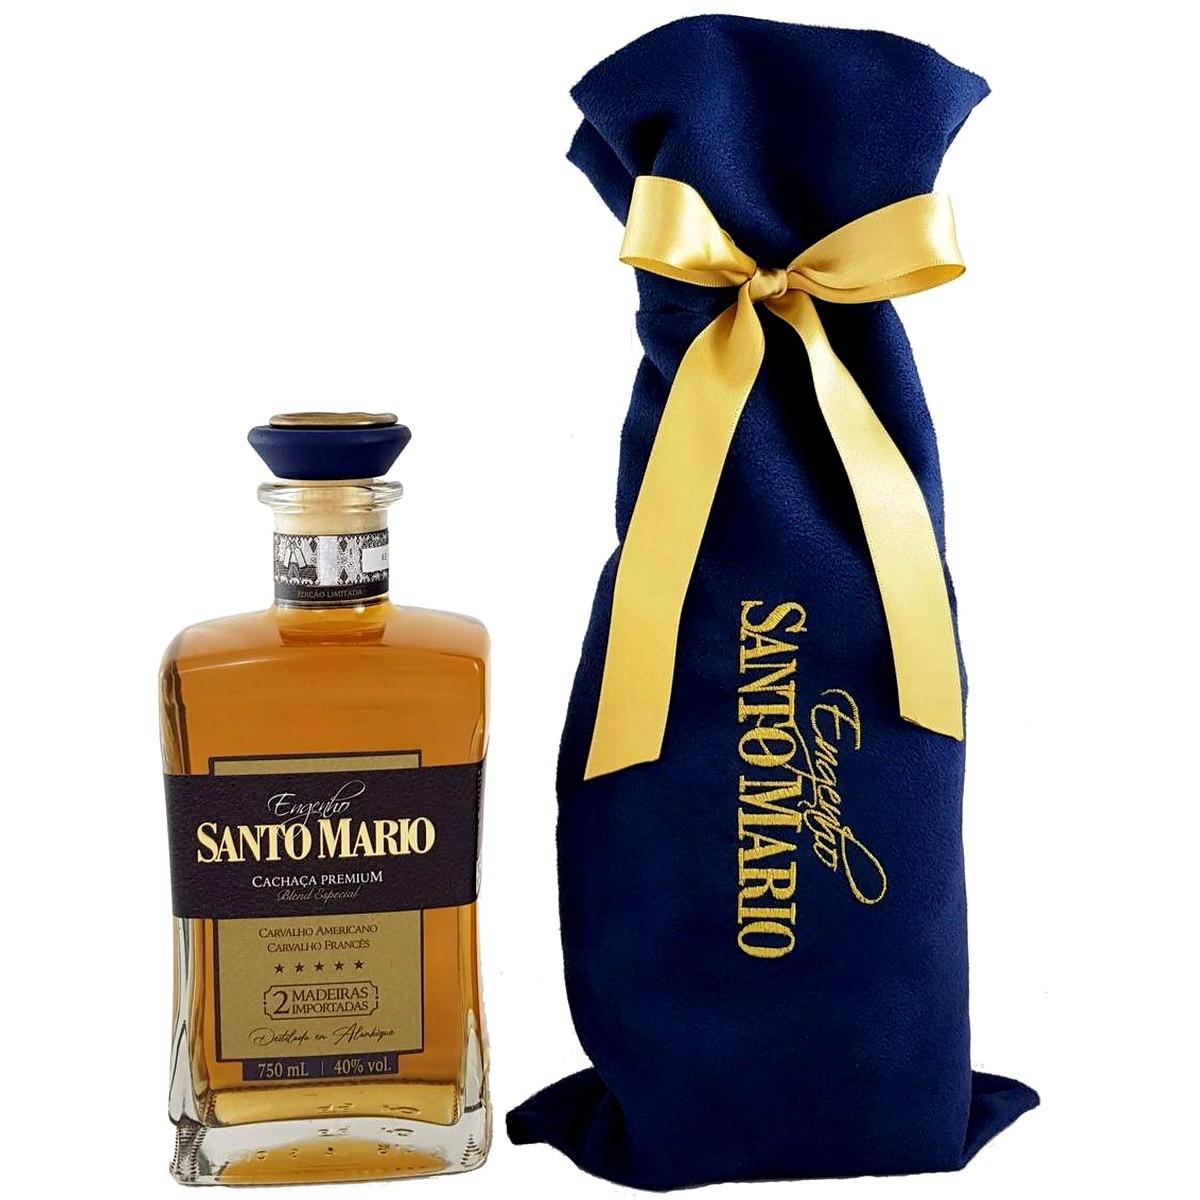 Cachaça Santo Mario Extra Premium 2 Madeiras Importadas 750ml